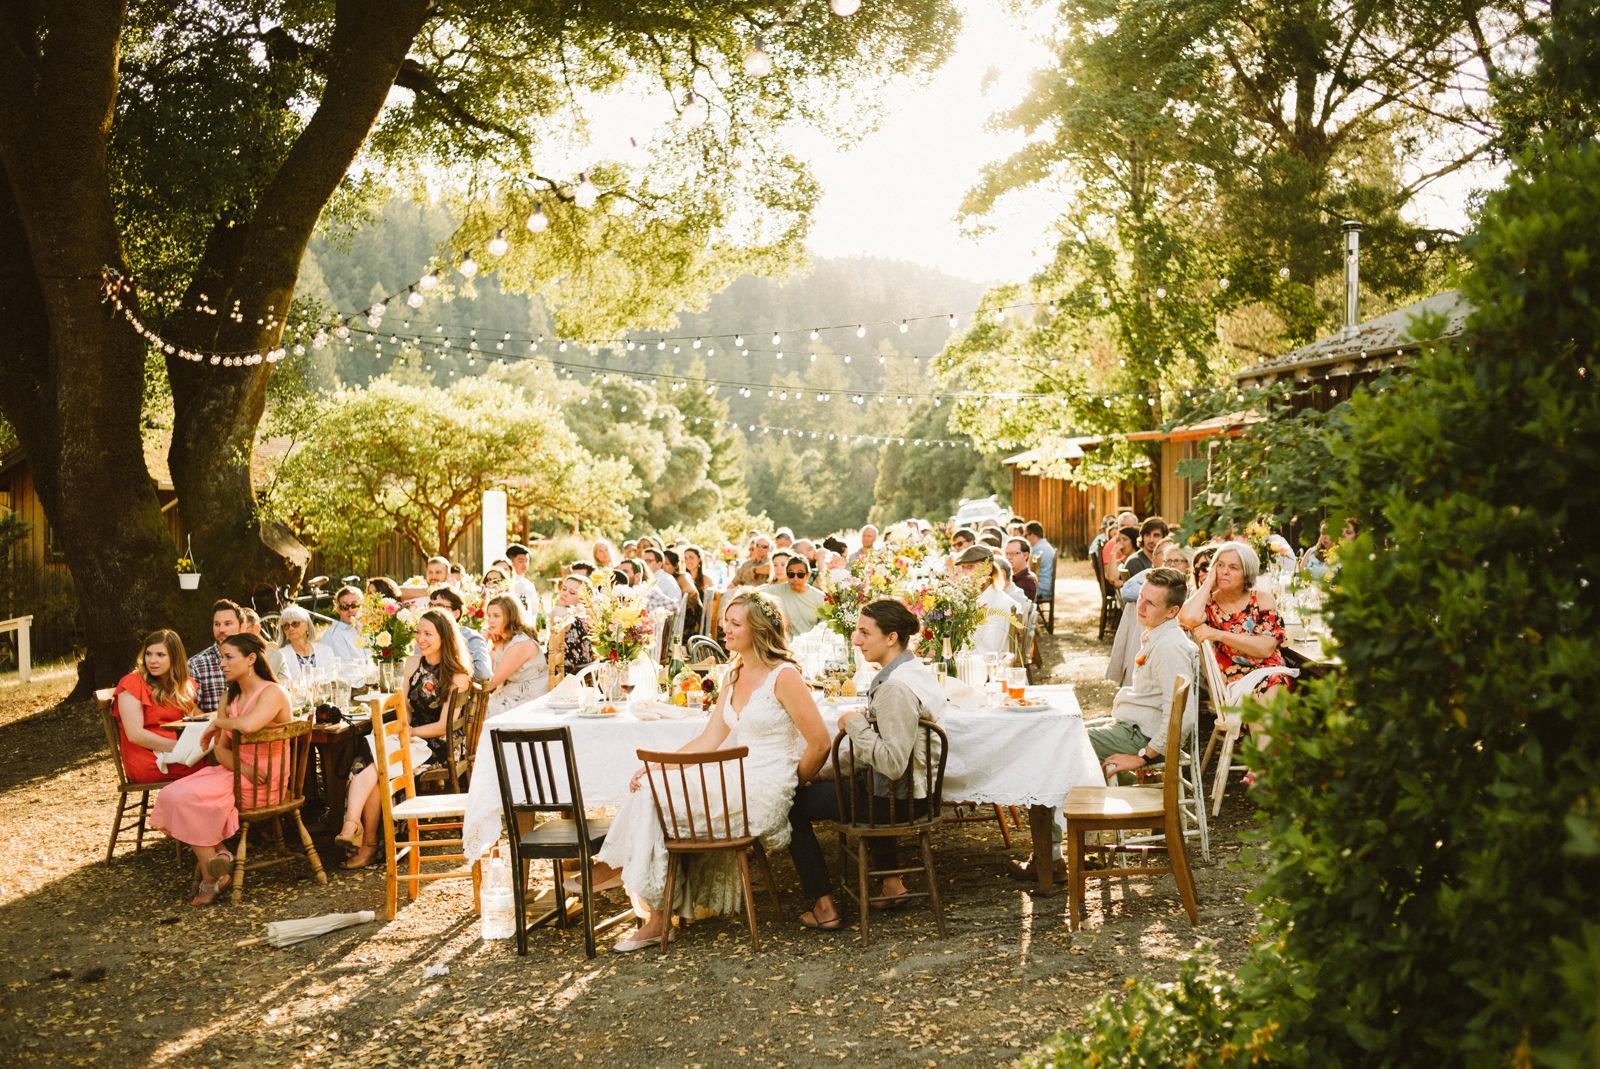 rivers-bend-retreat-wedding-085 RIVER'S BEND RETREAT WEDDING